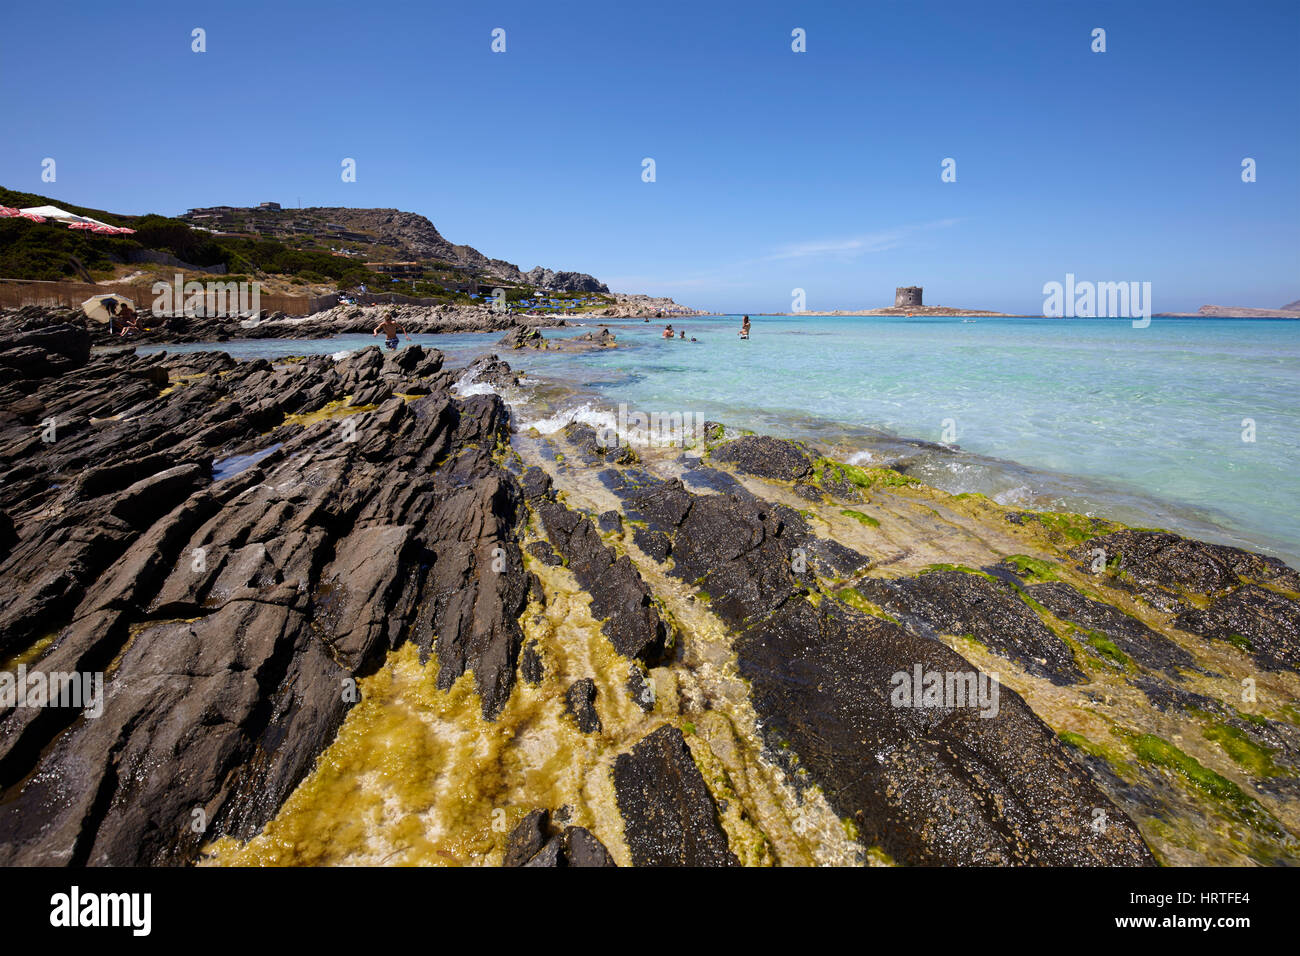 Das Meer in Stintino mit La Pelosa Turm, Sardinien, Italien Stockbild